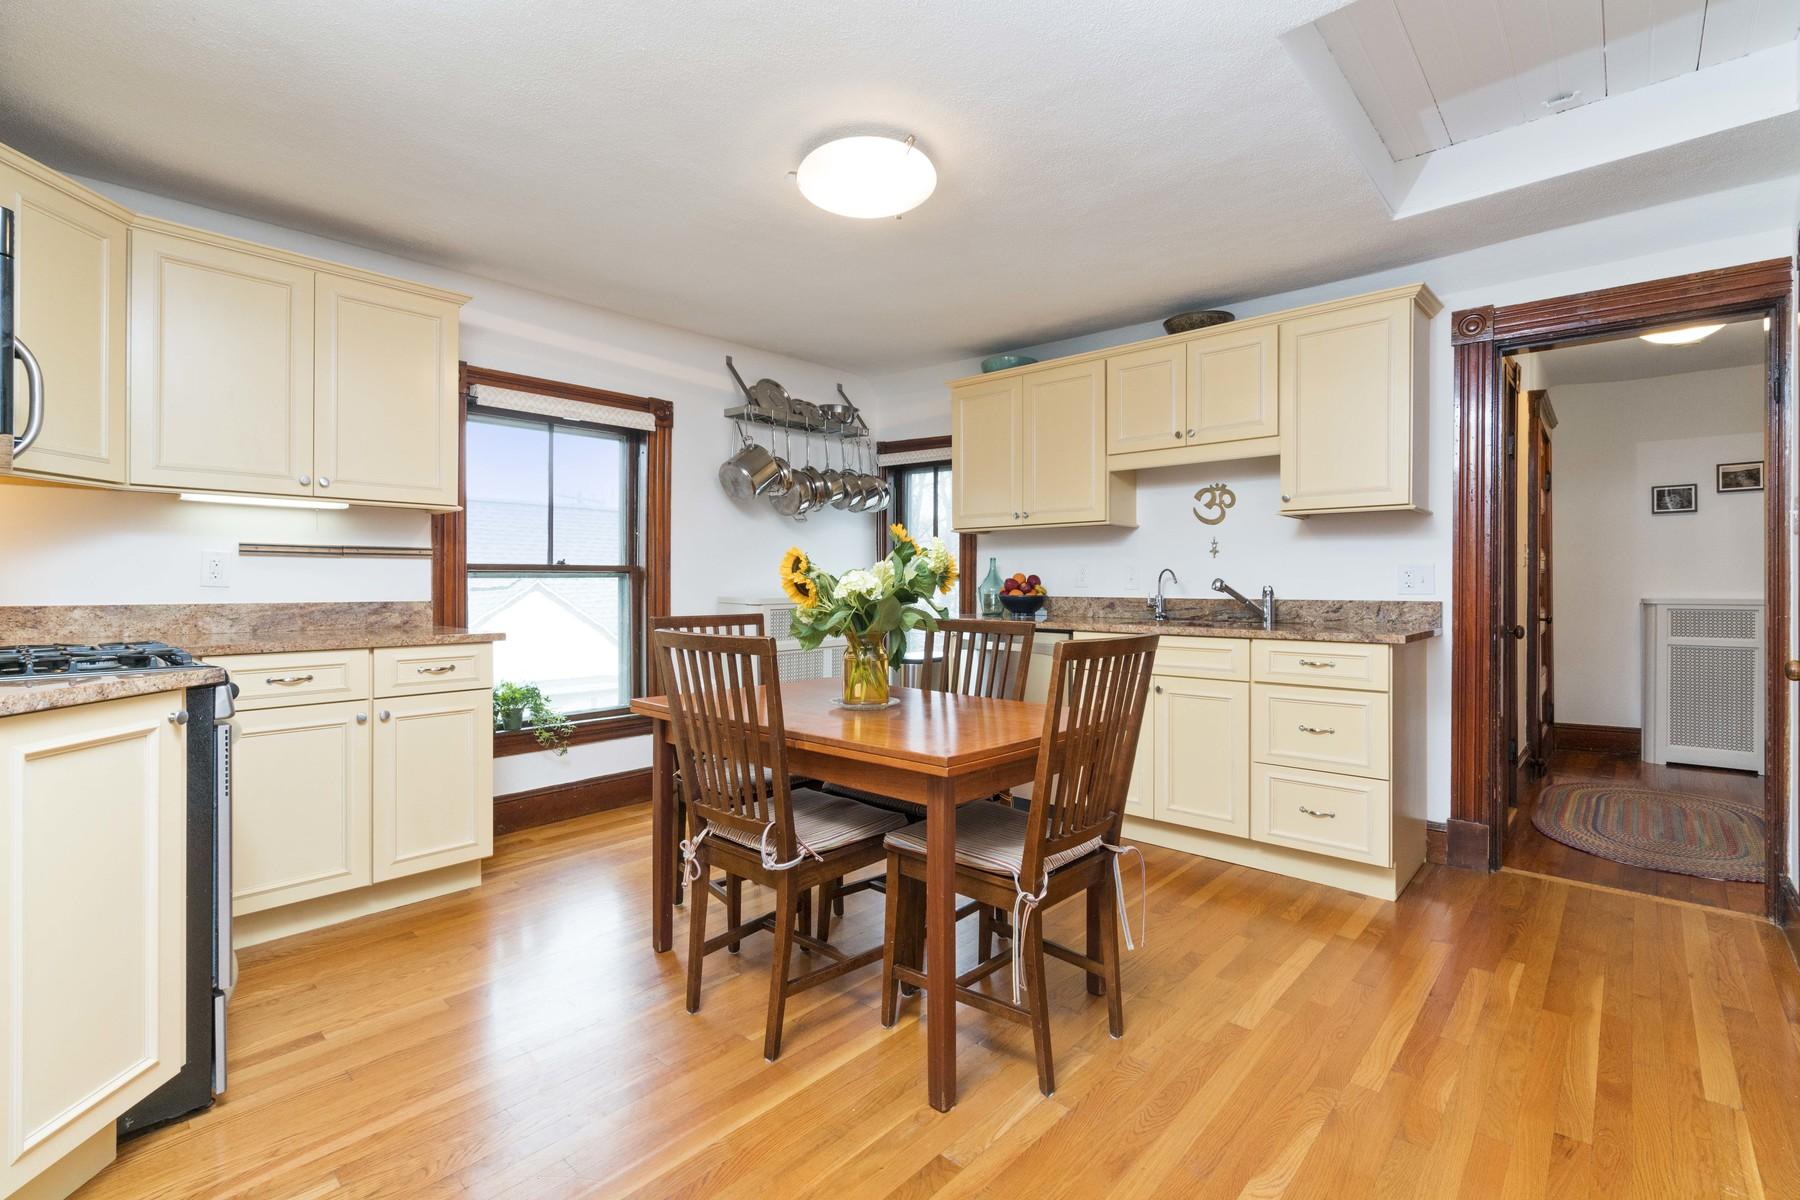 Condomínio para Venda às 20 Foskett St, Unit 3, Somerville 20 Foskett Street Unit 3 Somerville, Massachusetts, 02144 Estados Unidos